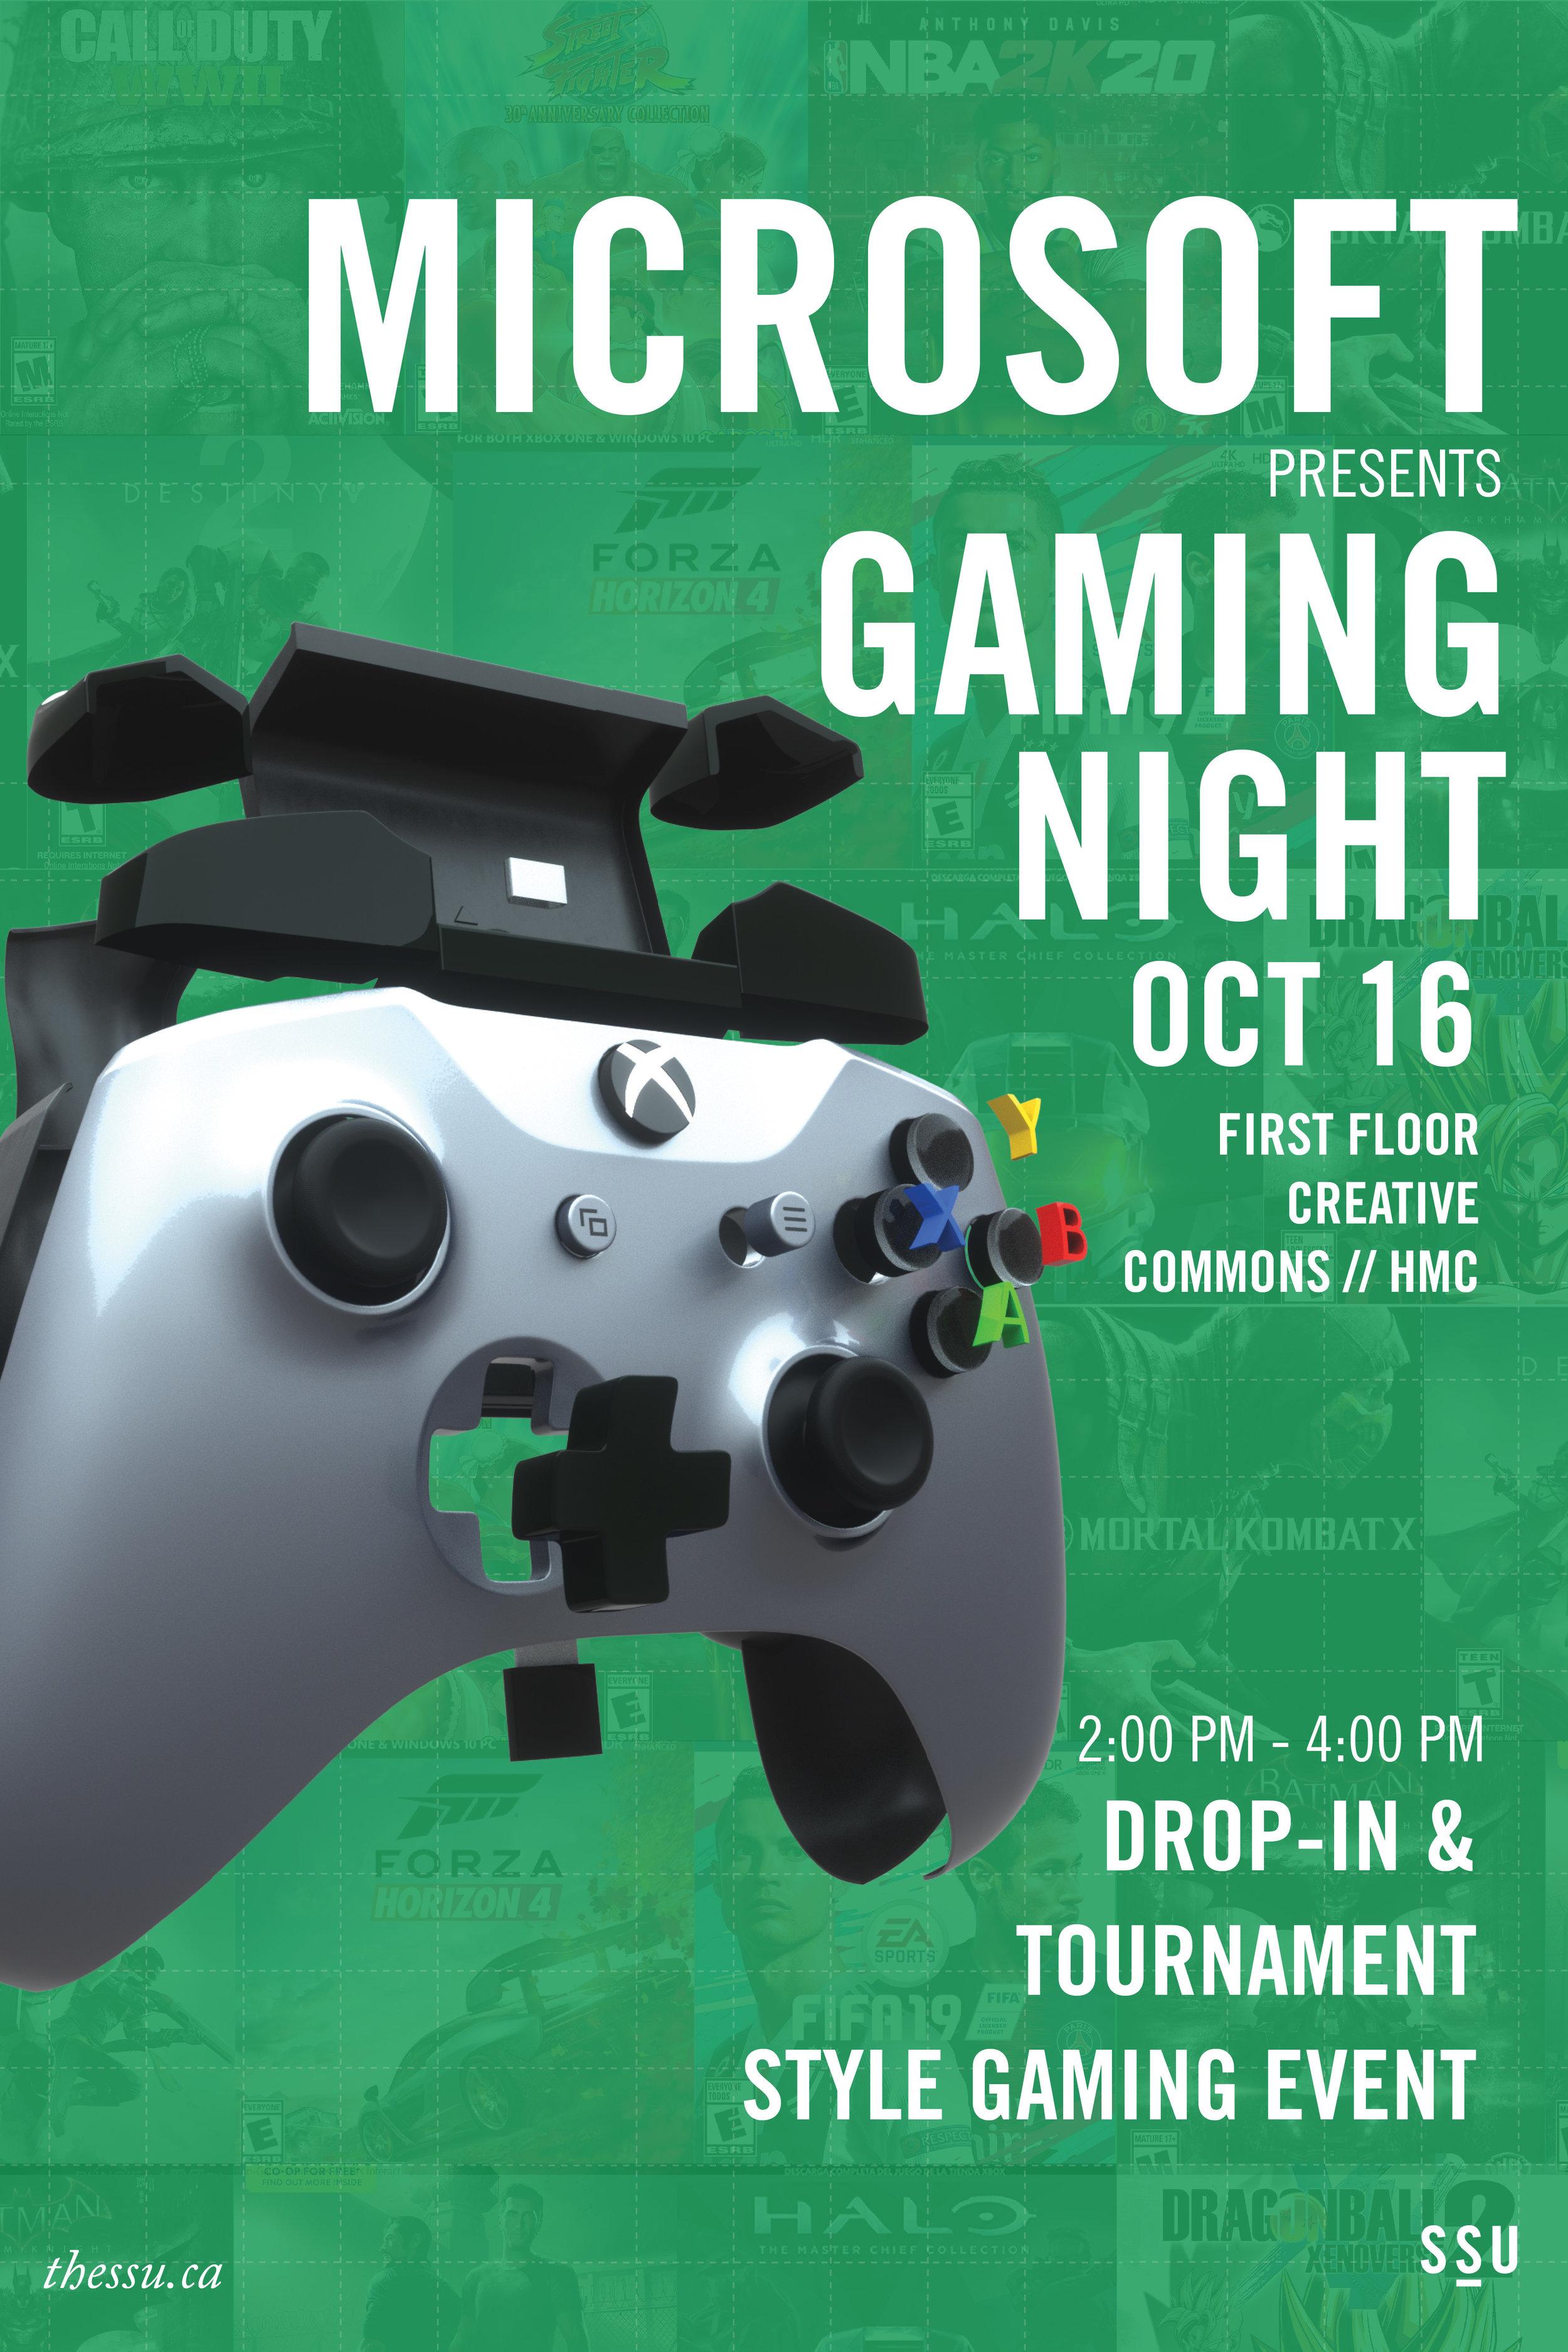 Microsoft_Gaming_Poster_WEB-01.jpg